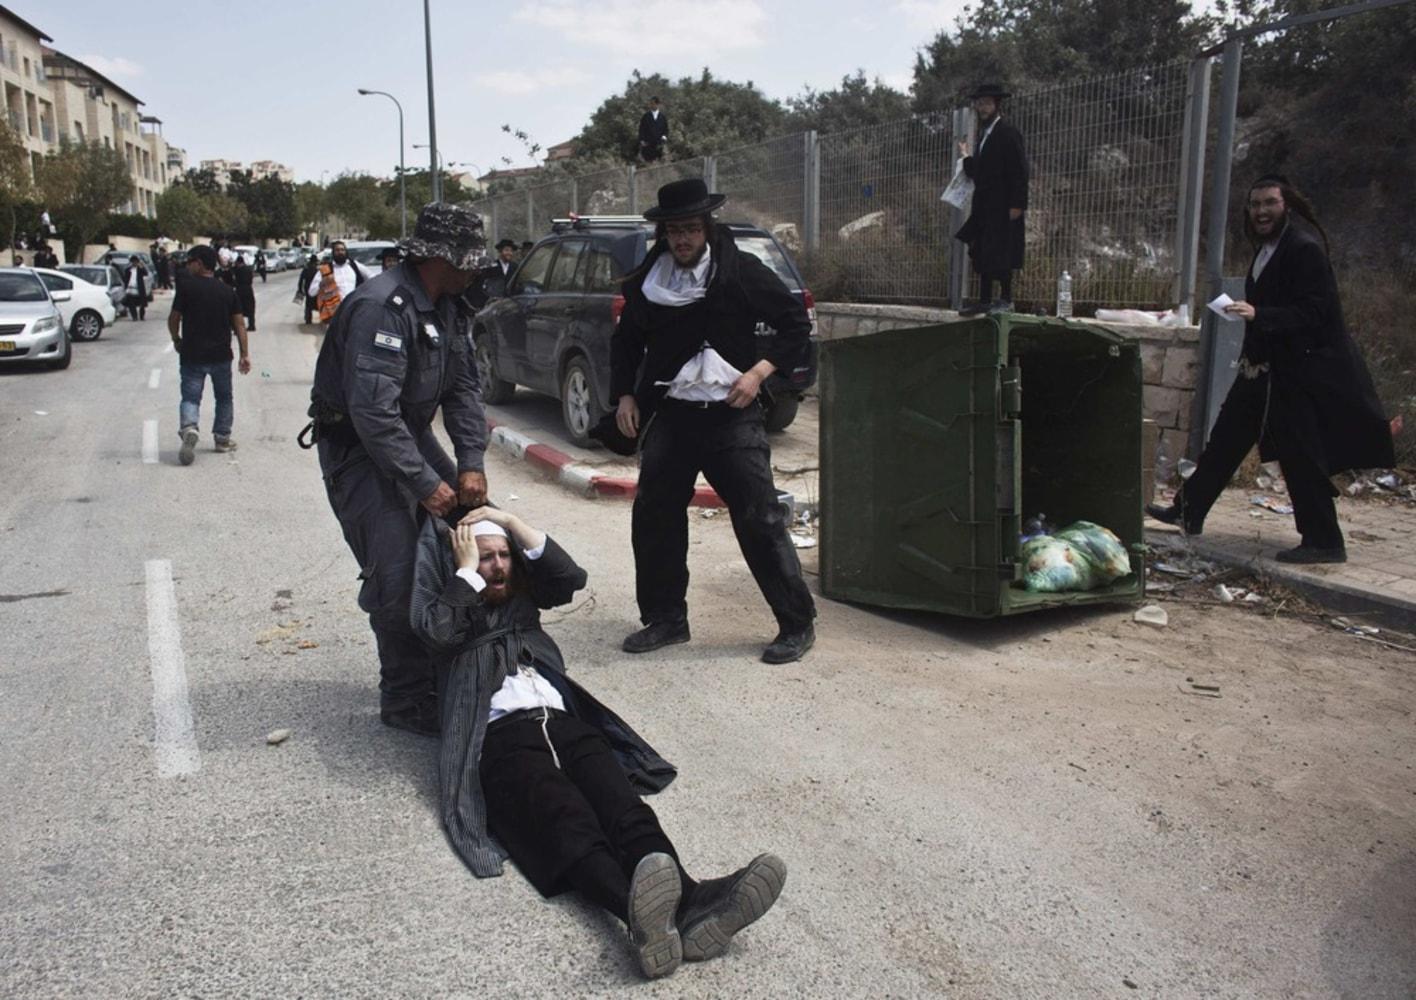 Orthodox Beit Shemesh: Ultra-Orthodox Jewish Protesters: Israel Housing Project